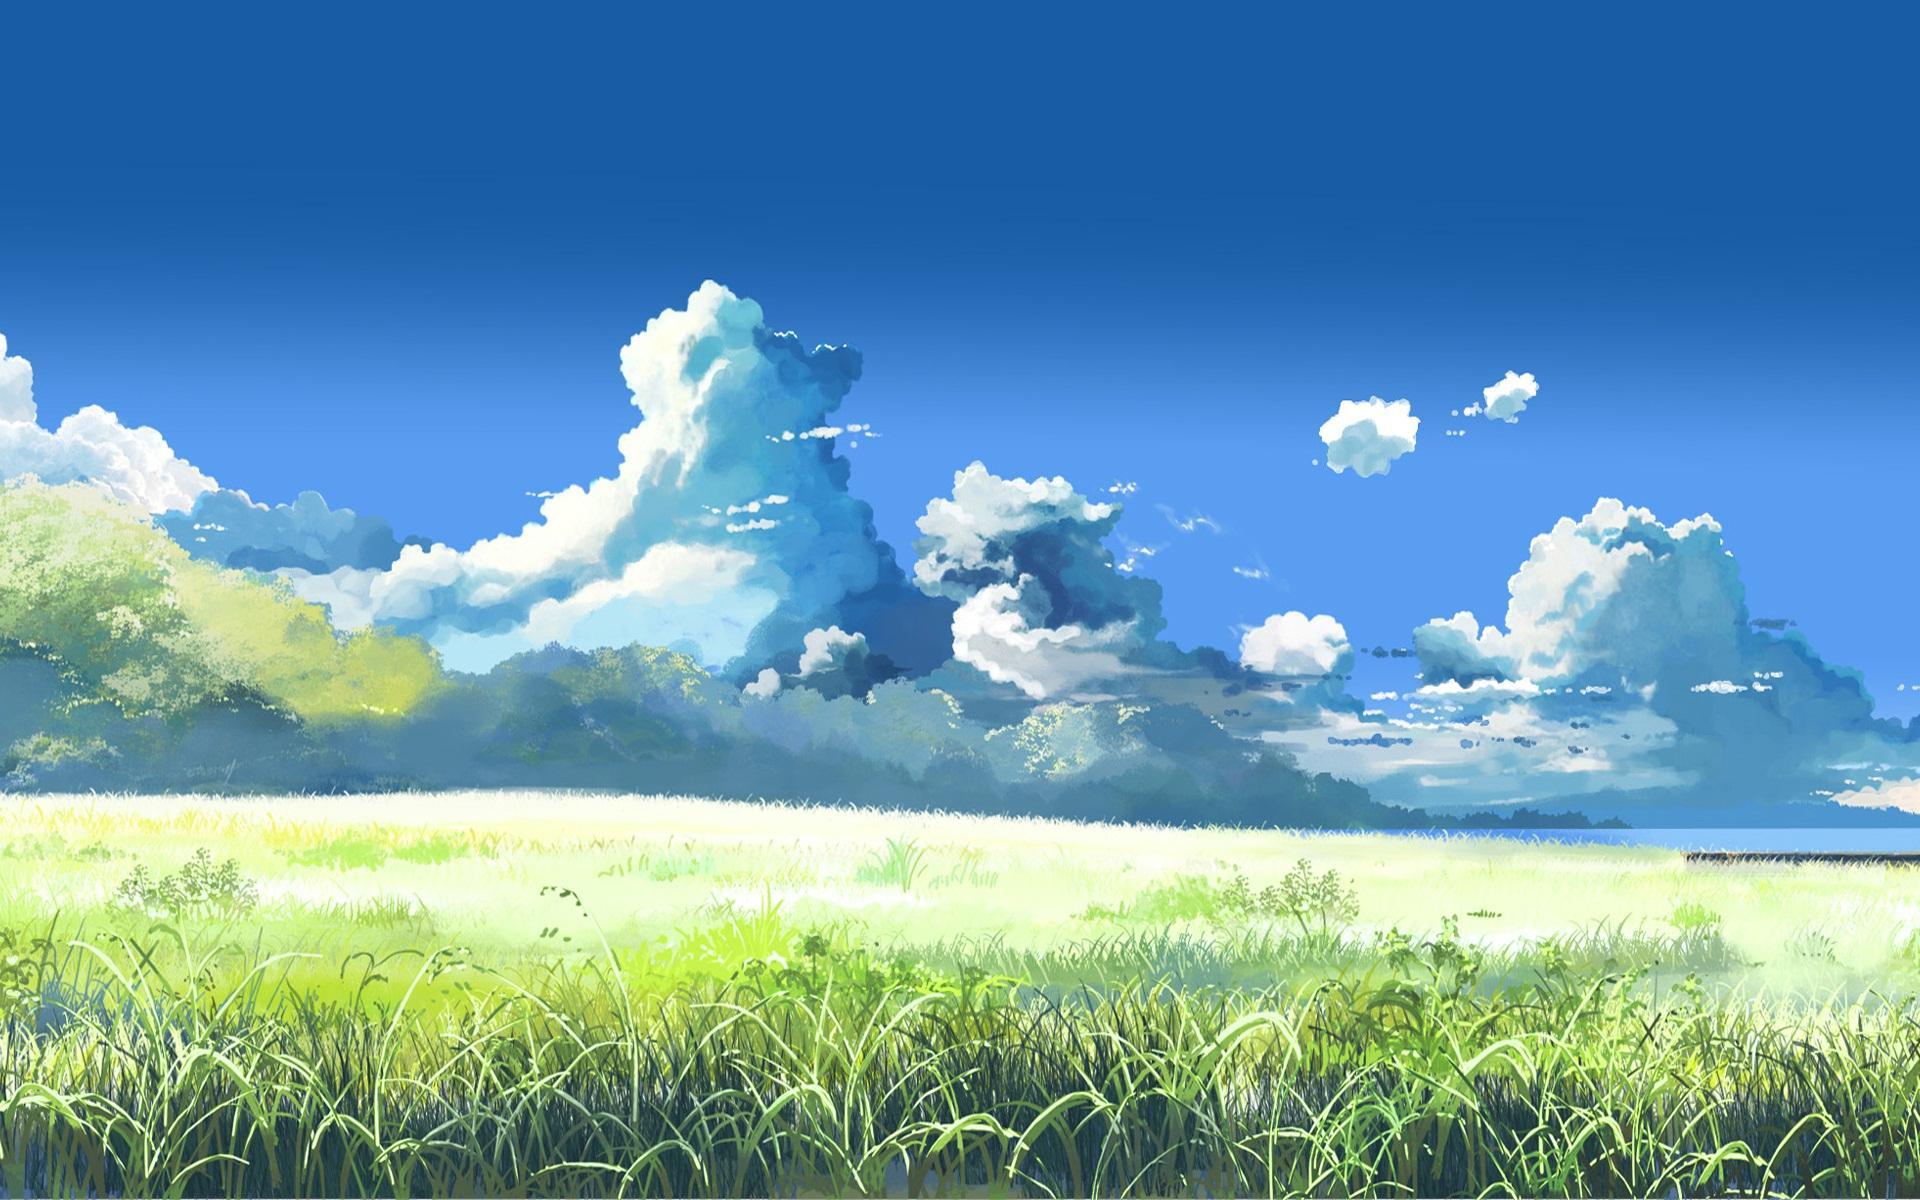 Anime Landscape Wallpaper 1920x1200 ID36447   WallpaperVortexcom 1920x1200